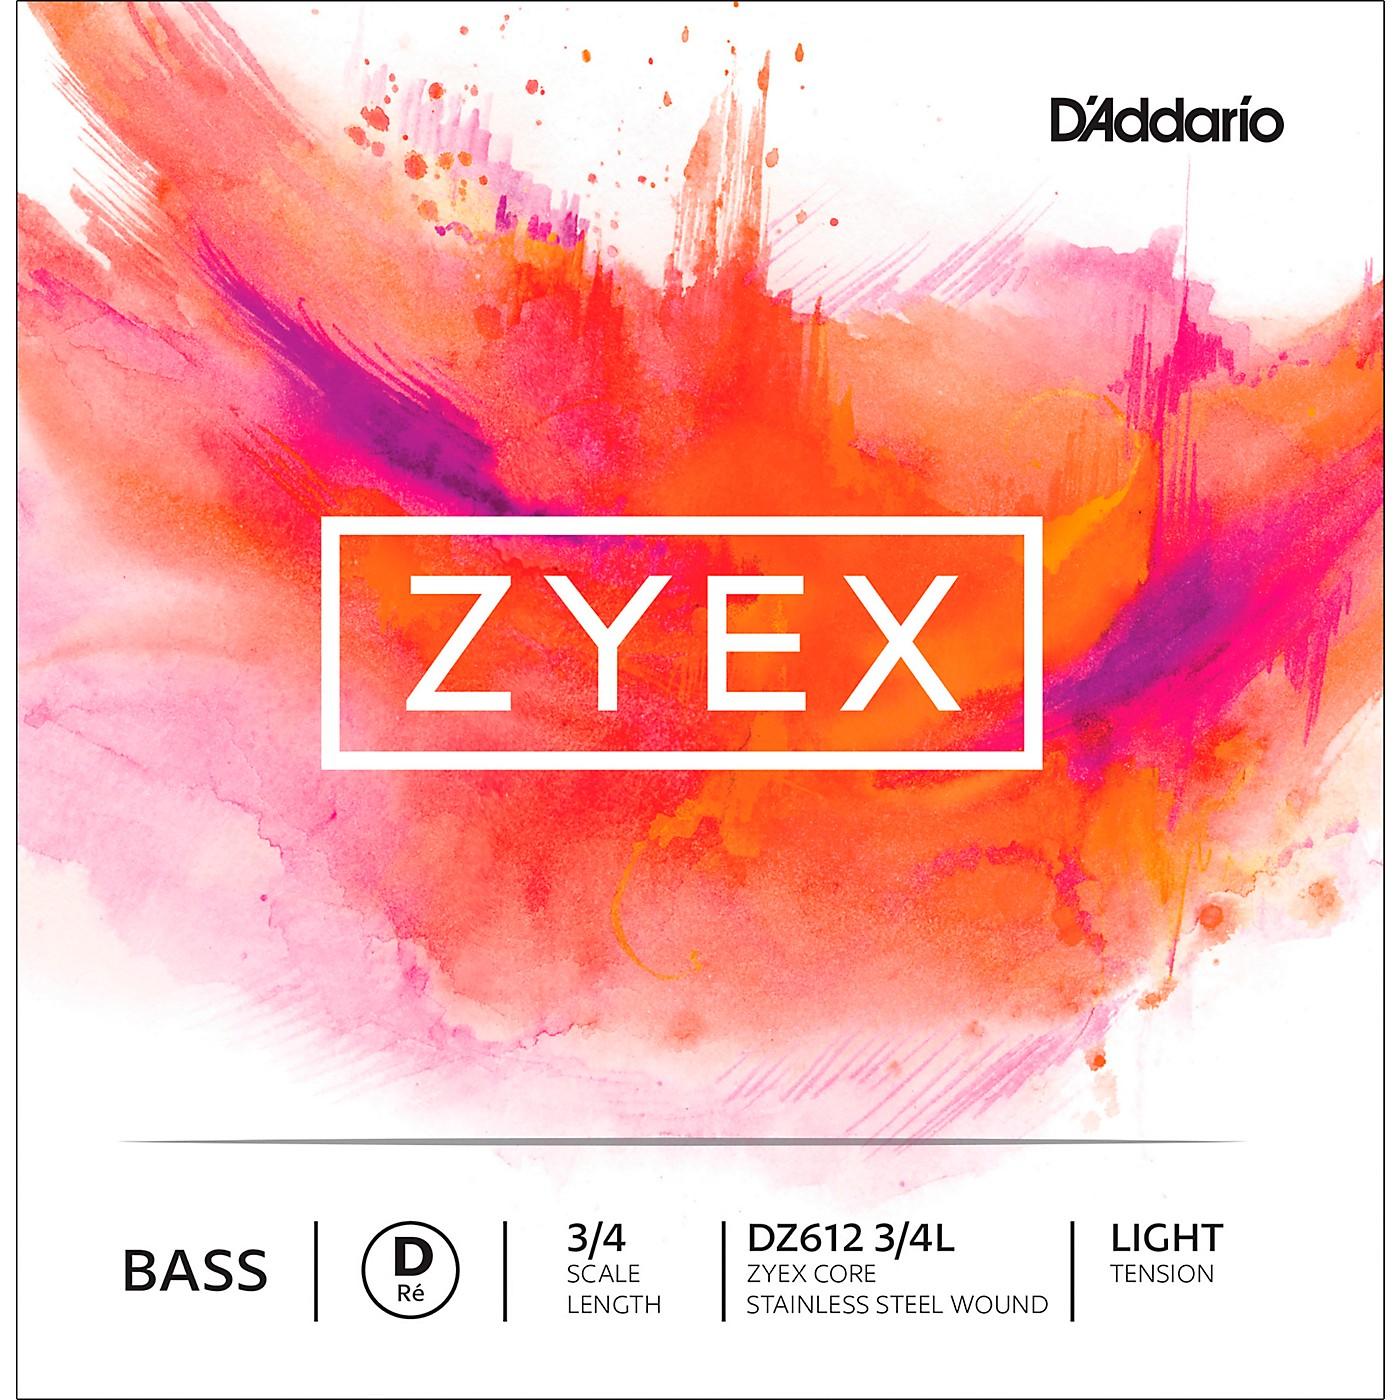 D'Addario DZ612 Zyex 3/4 Bass Single D String thumbnail